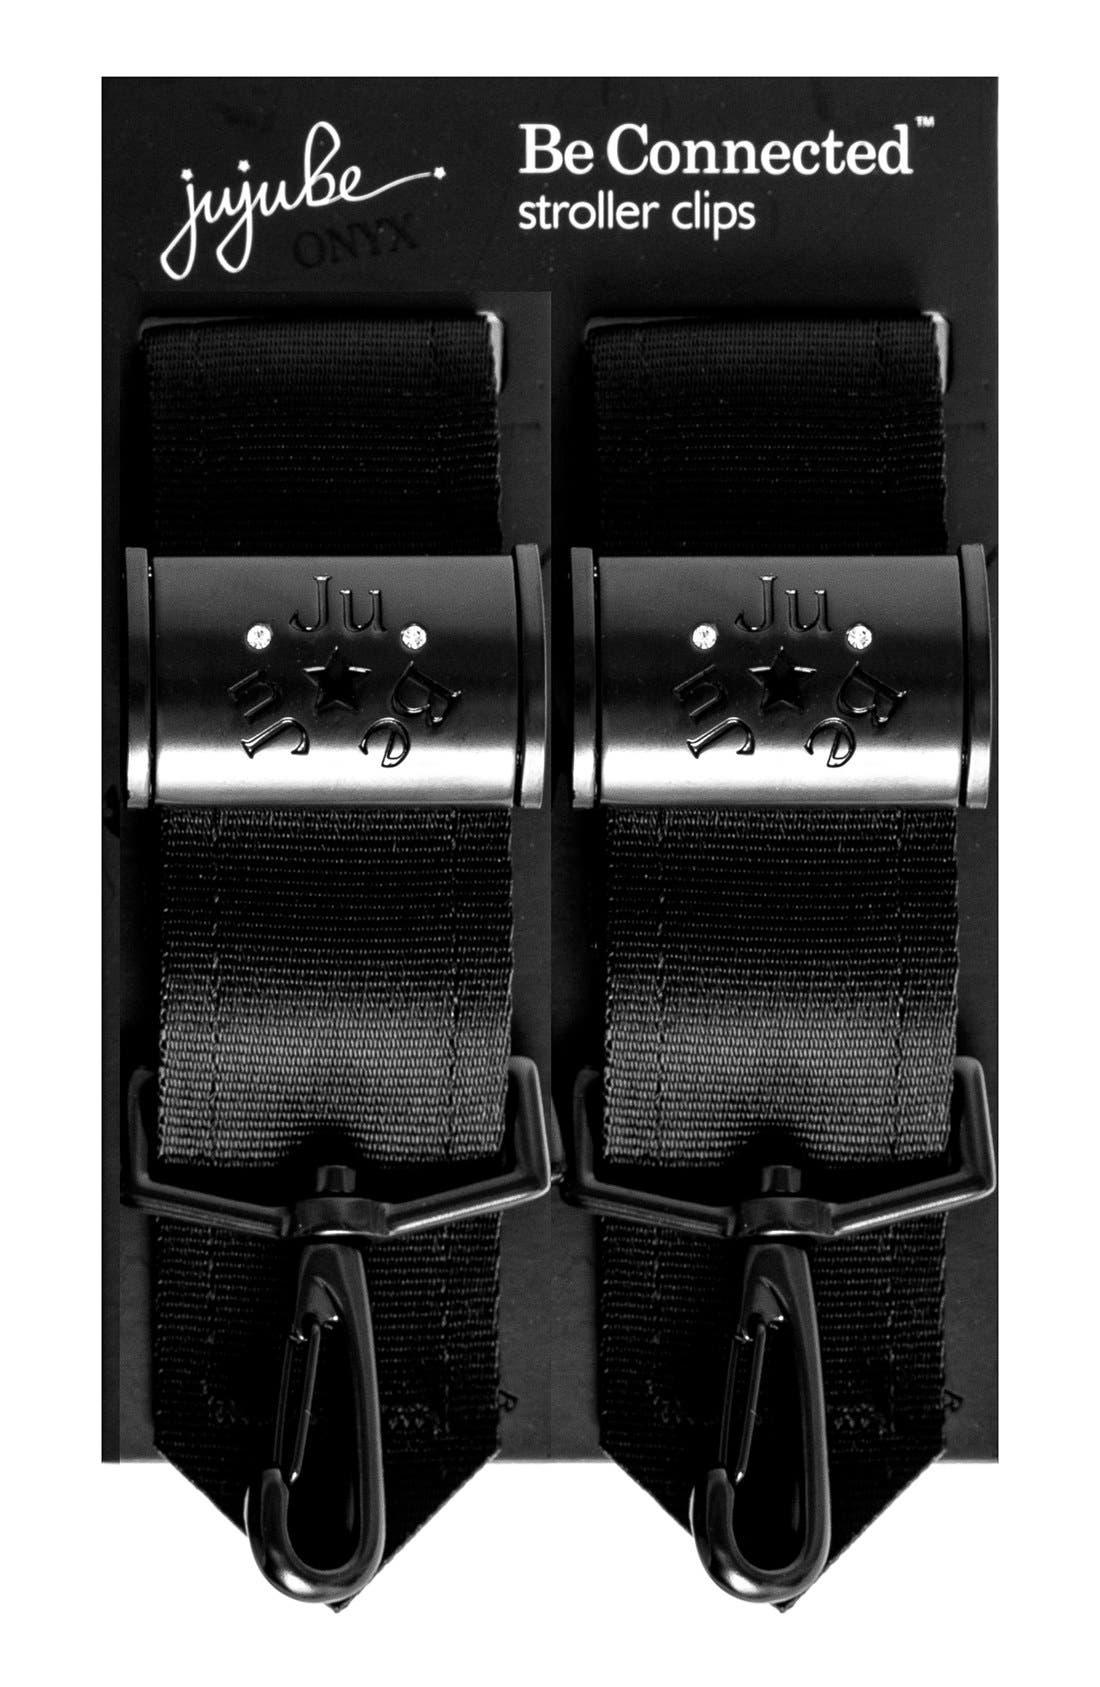 Ju-Ju-Be Be Connected Diaper Bag Stroller Clips